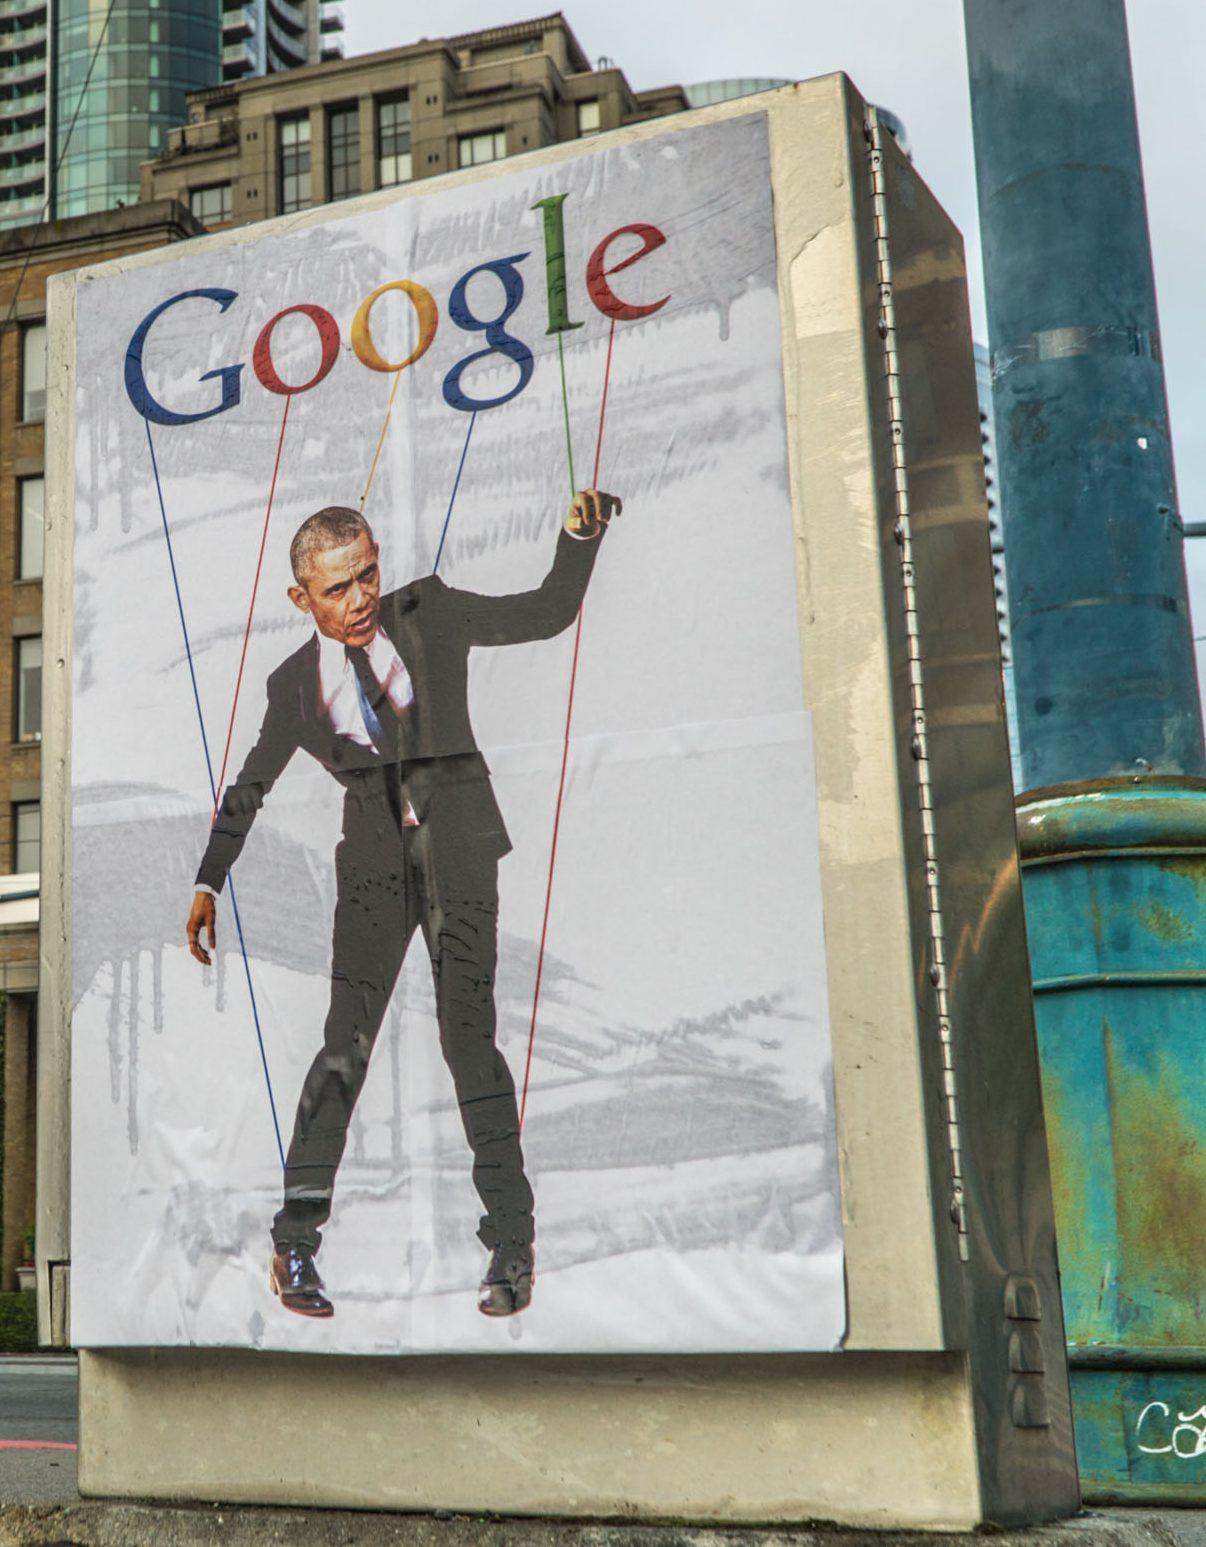 Fuck off Google - Google-Campus Kreuzberg verhindern!